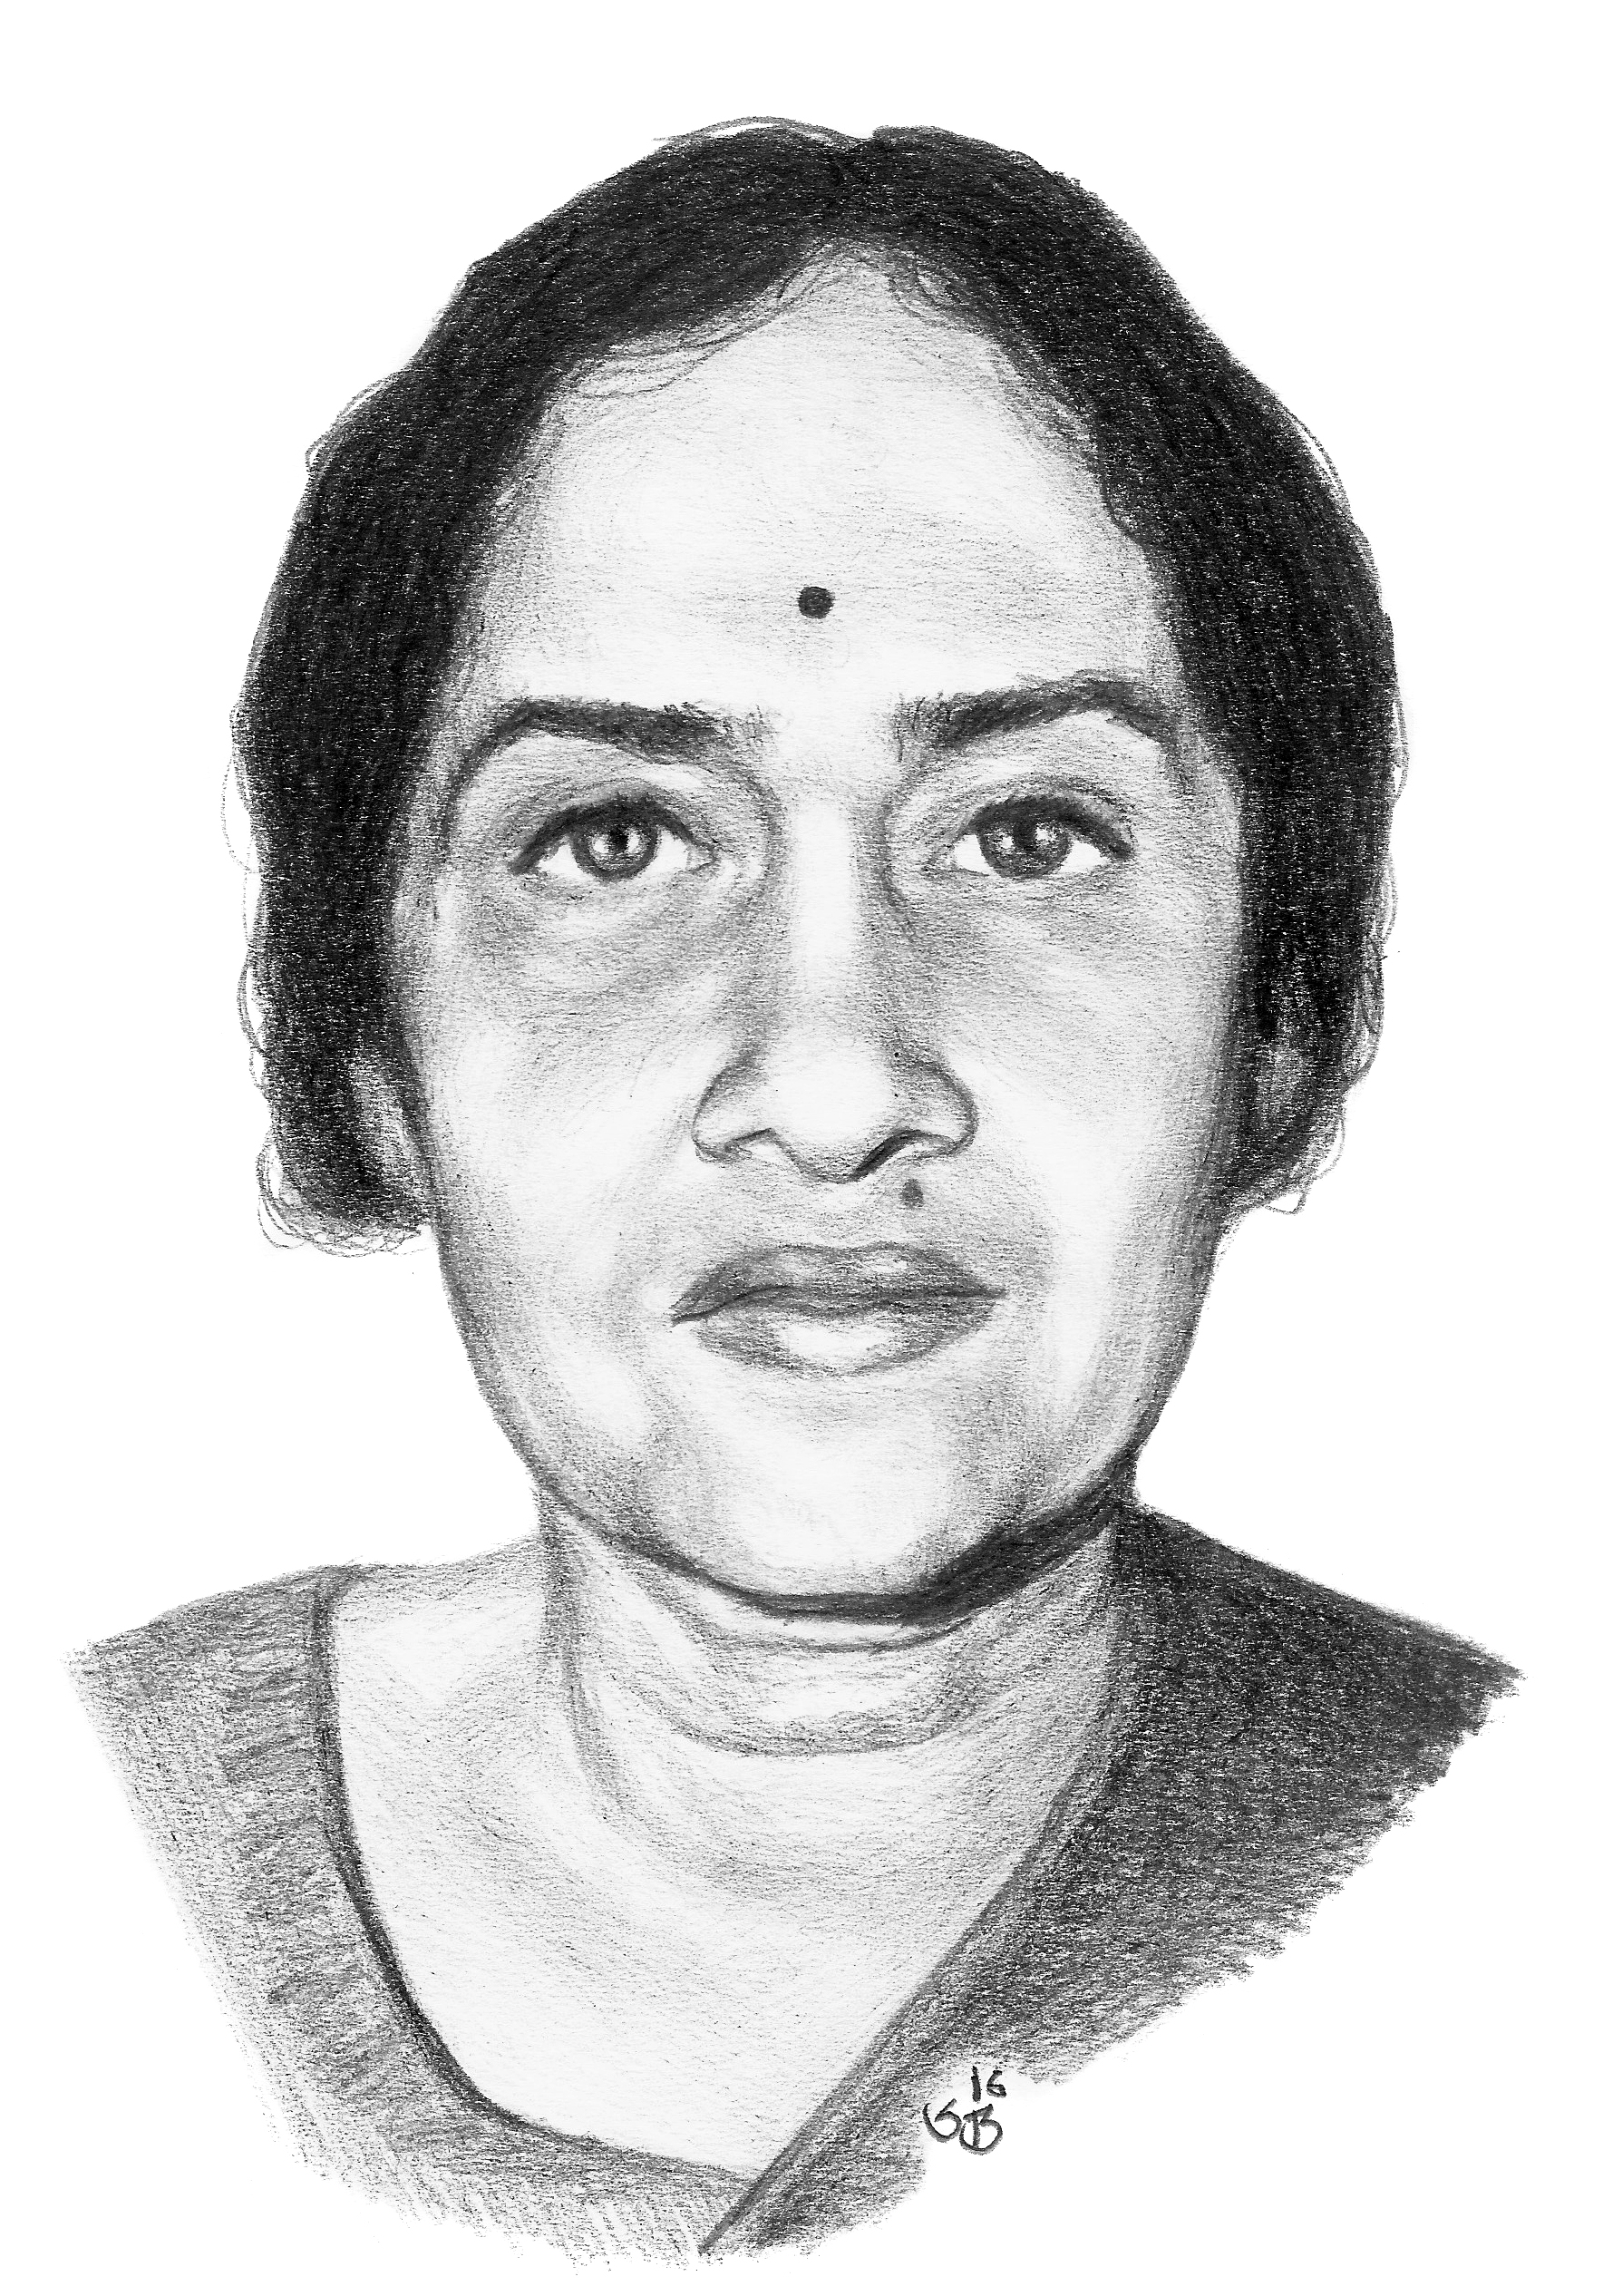 Kamala Sohoni by subhankar-biswas on DeviantArt